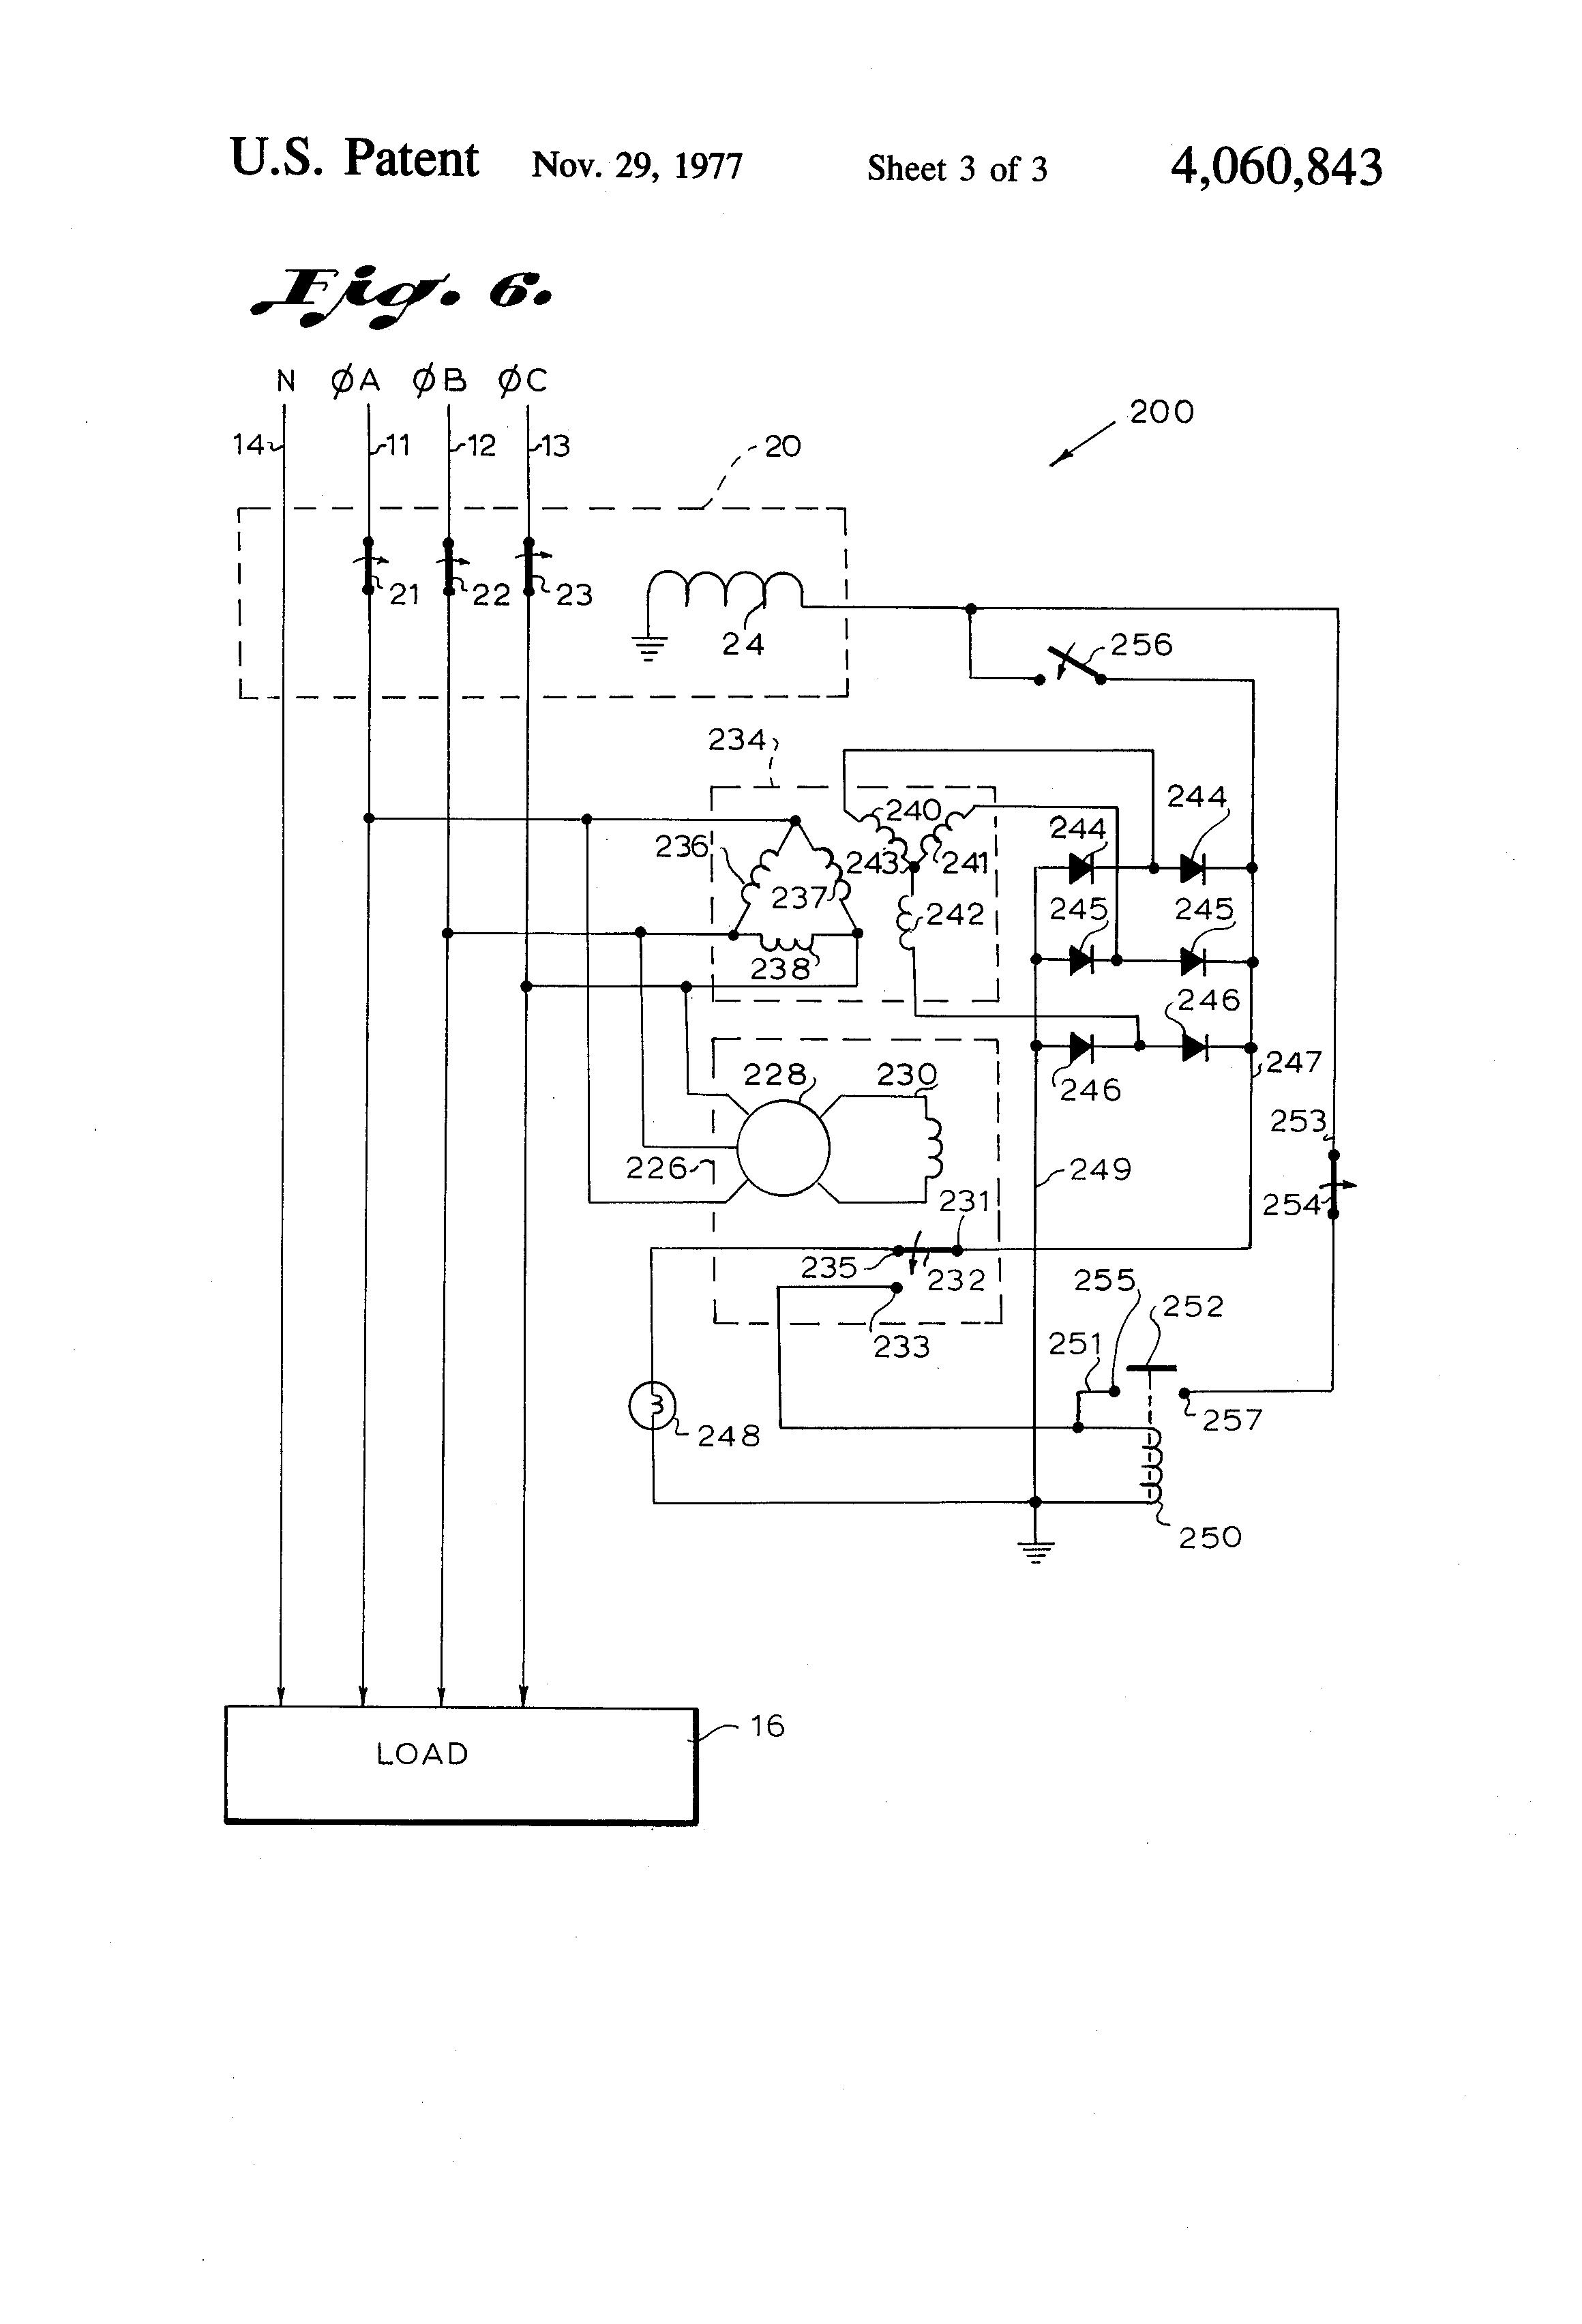 wiring diagram for shunt trip breaker the wiring diagram shunt trip breaker operation vidim wiring diagram wiring diagram